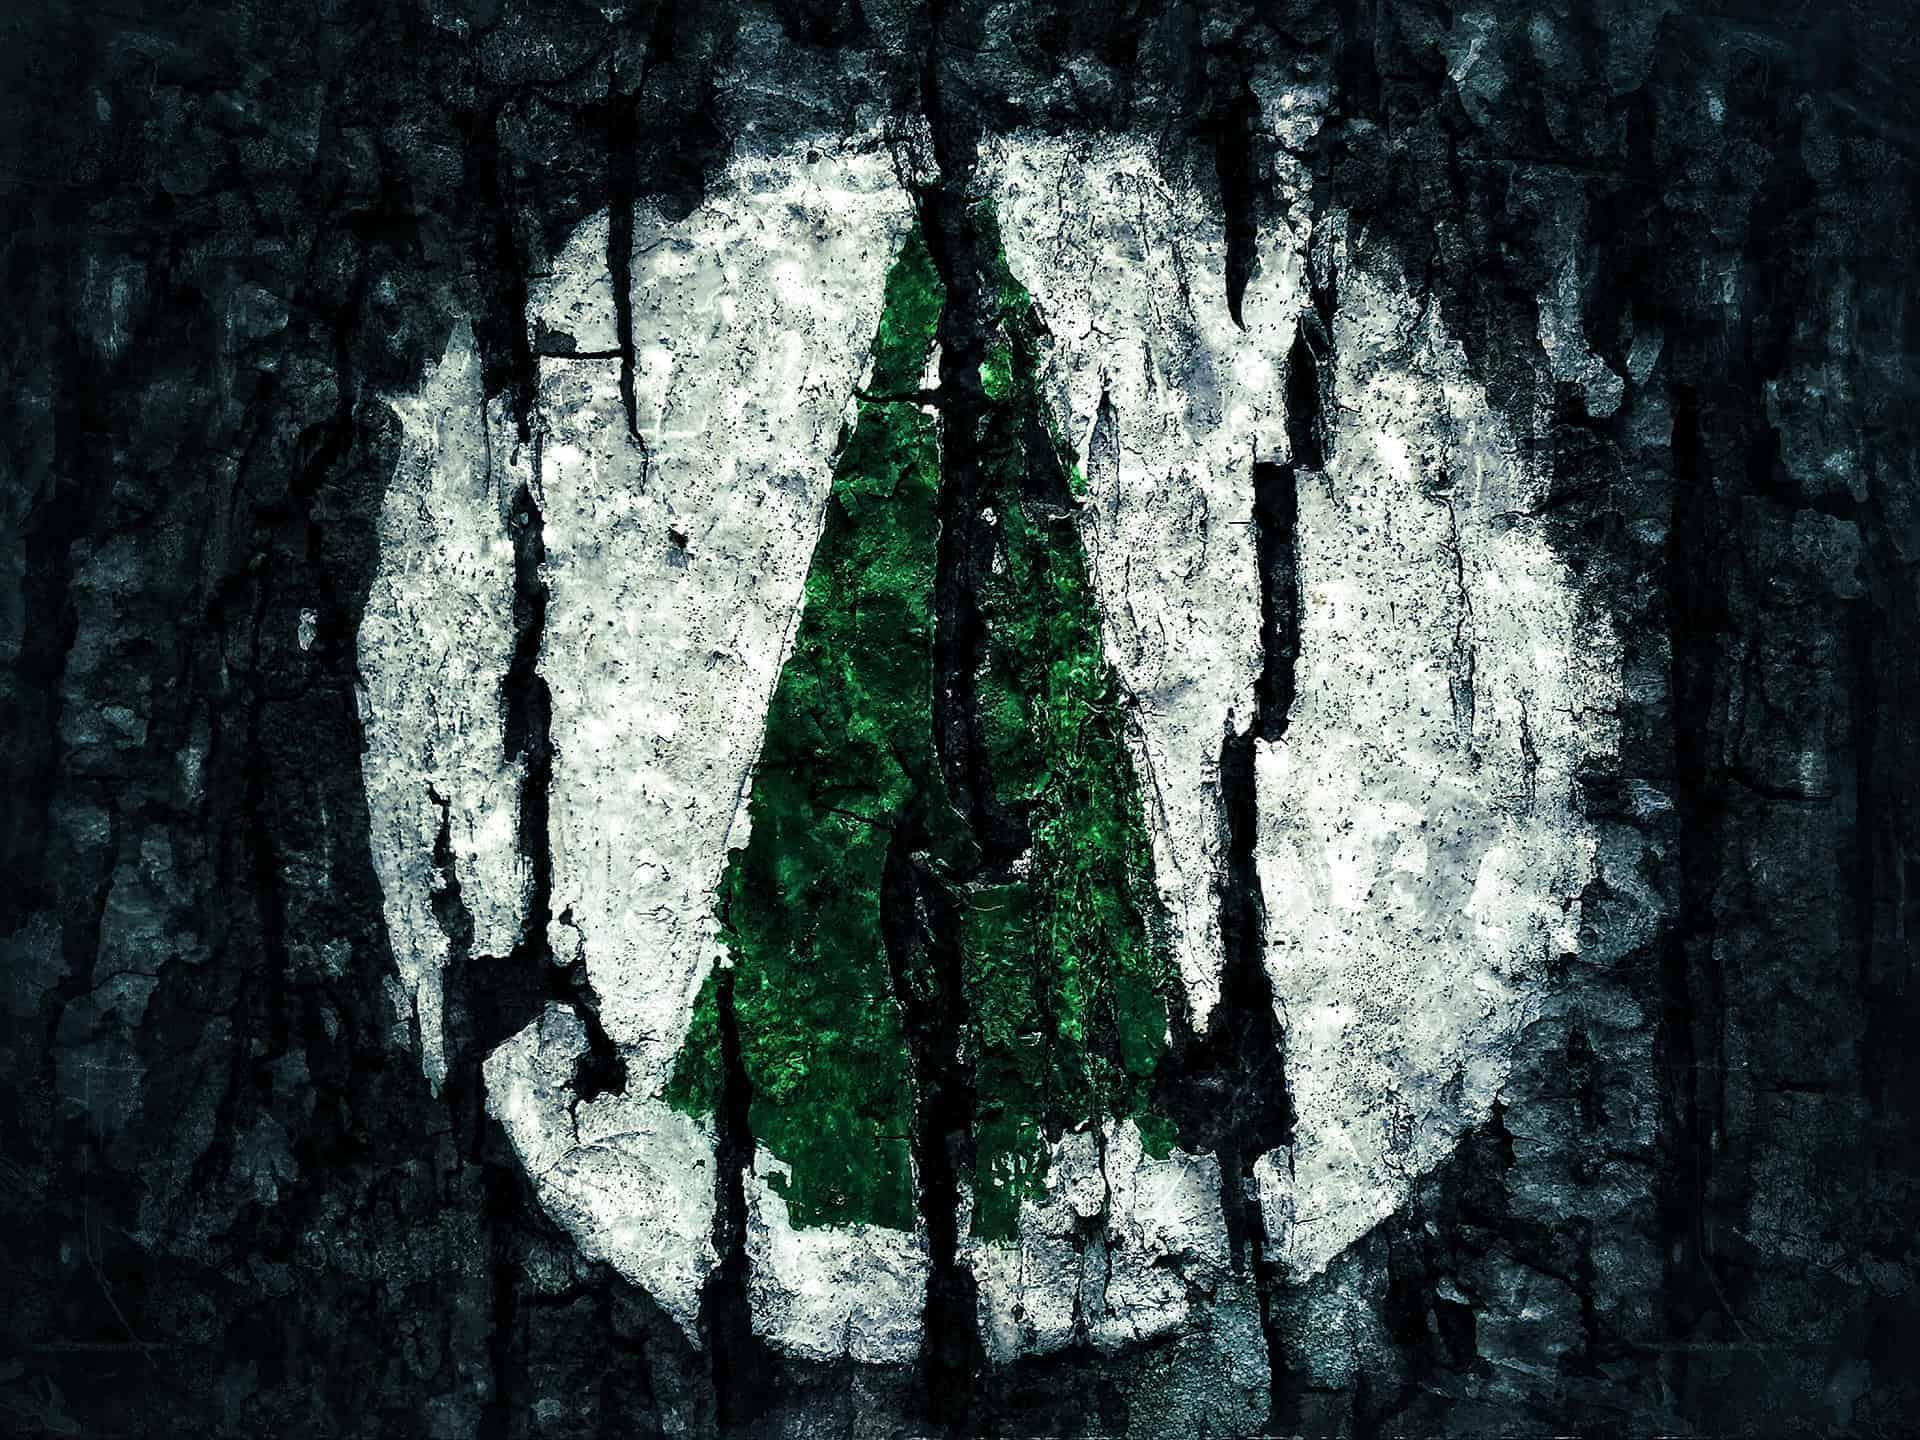 artnorama - Coniferous Tree